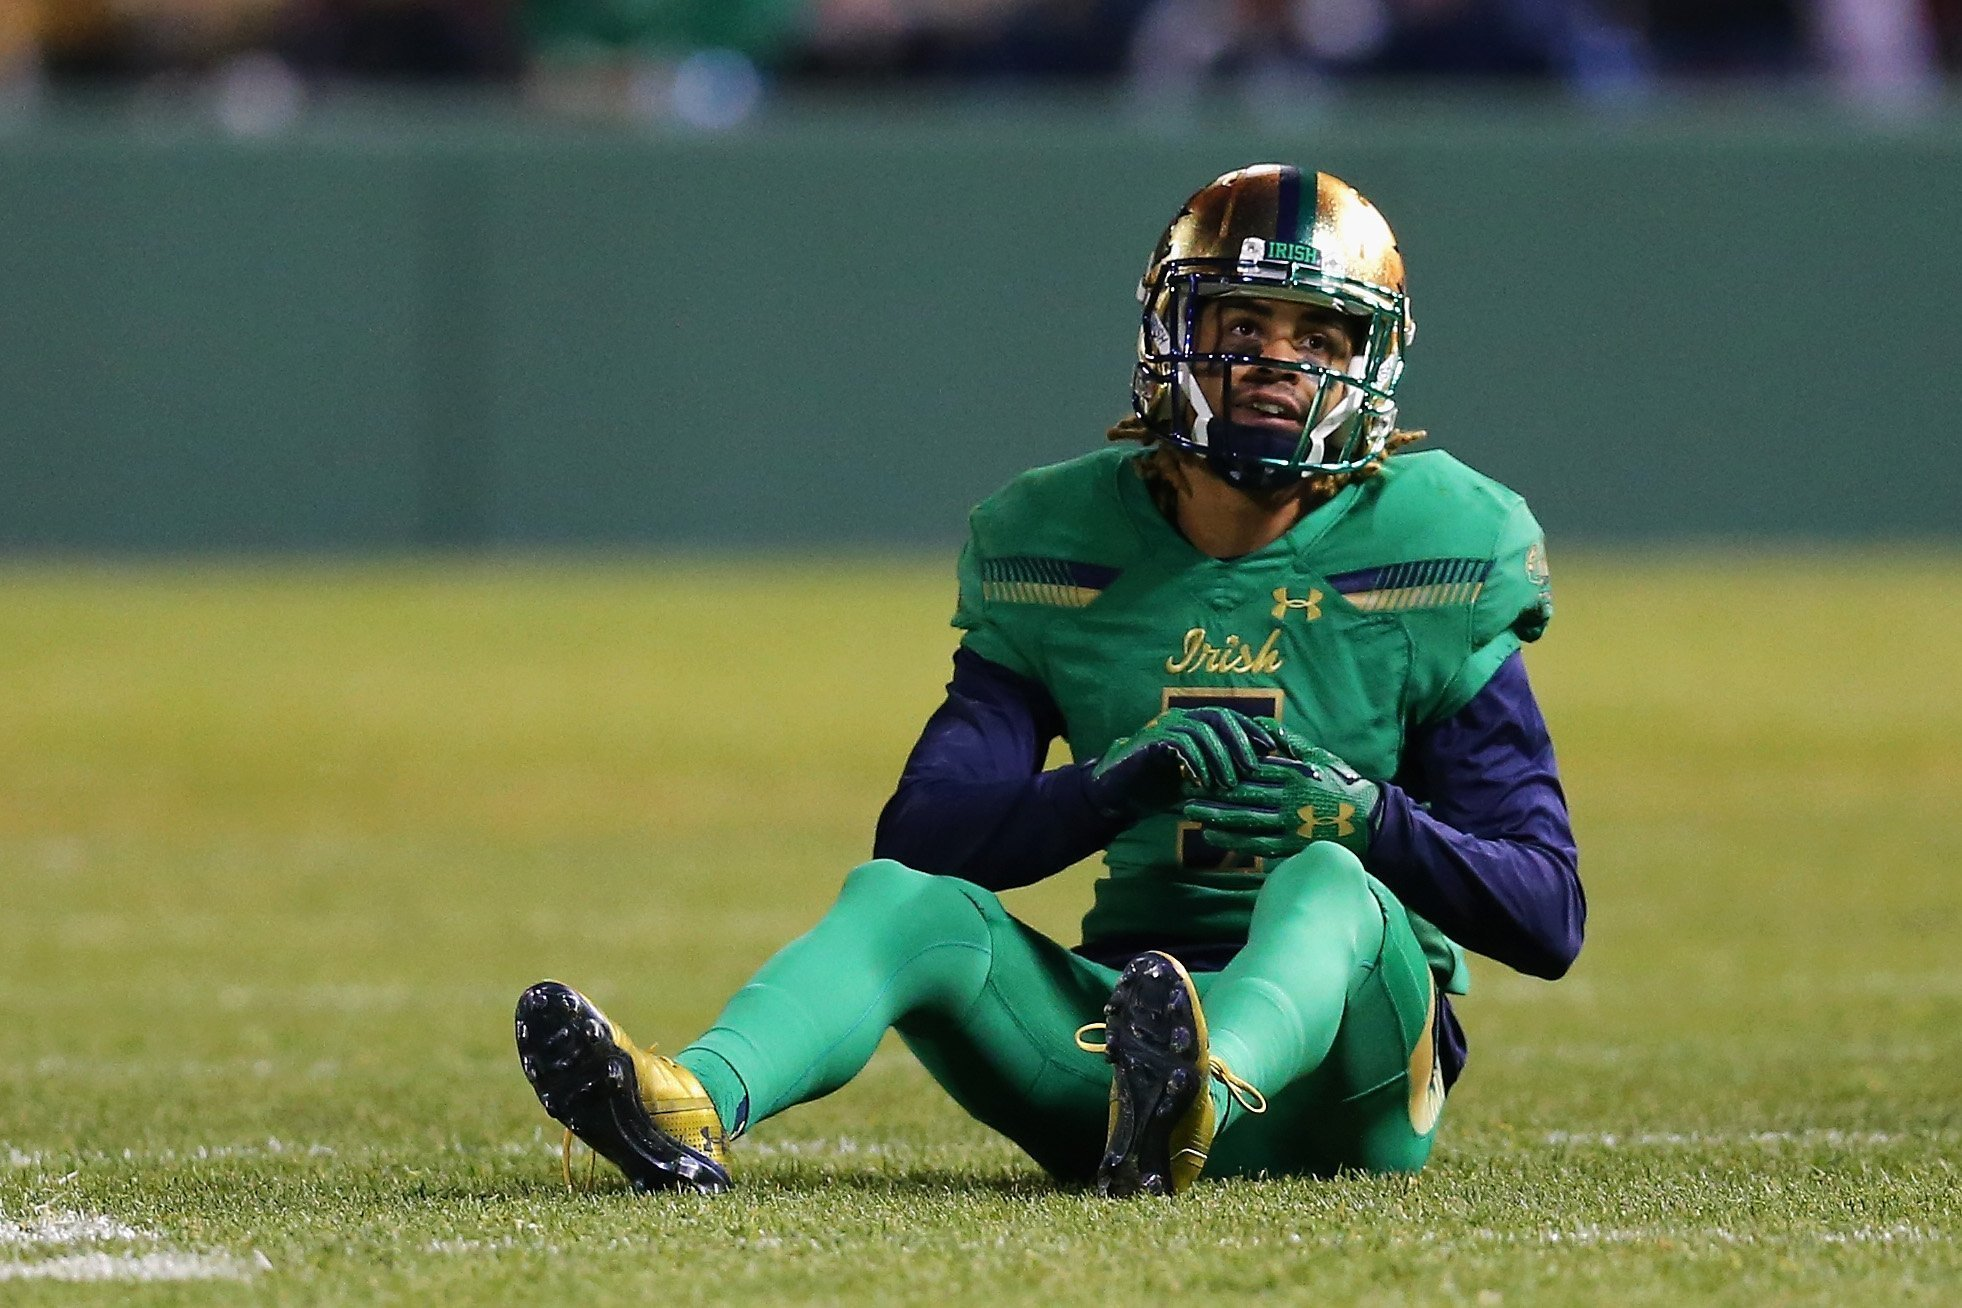 Notre Dame WR Will Fuller declares for NFL draft - Capital Gazette